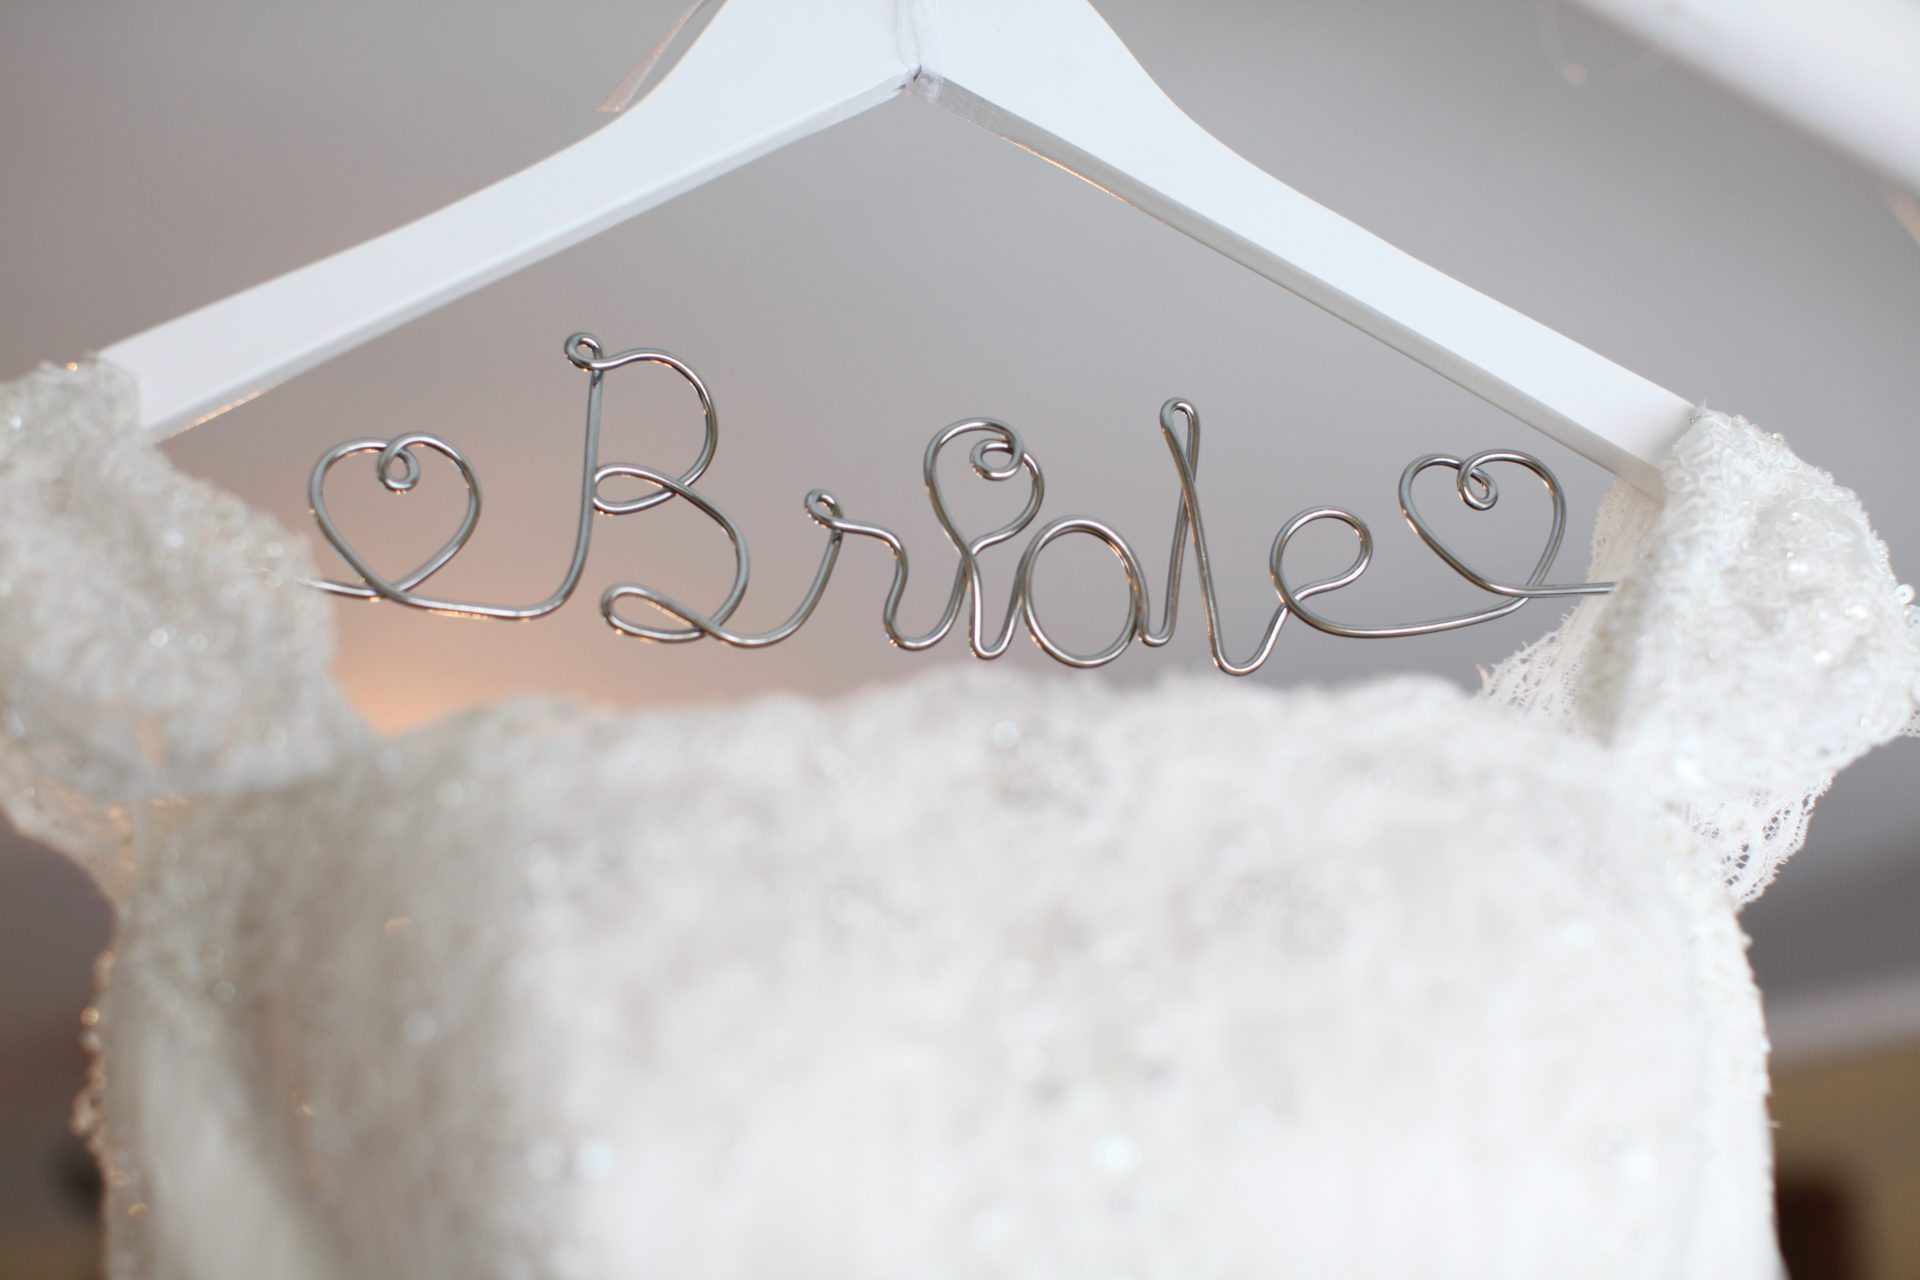 Bride wedding dress hanger